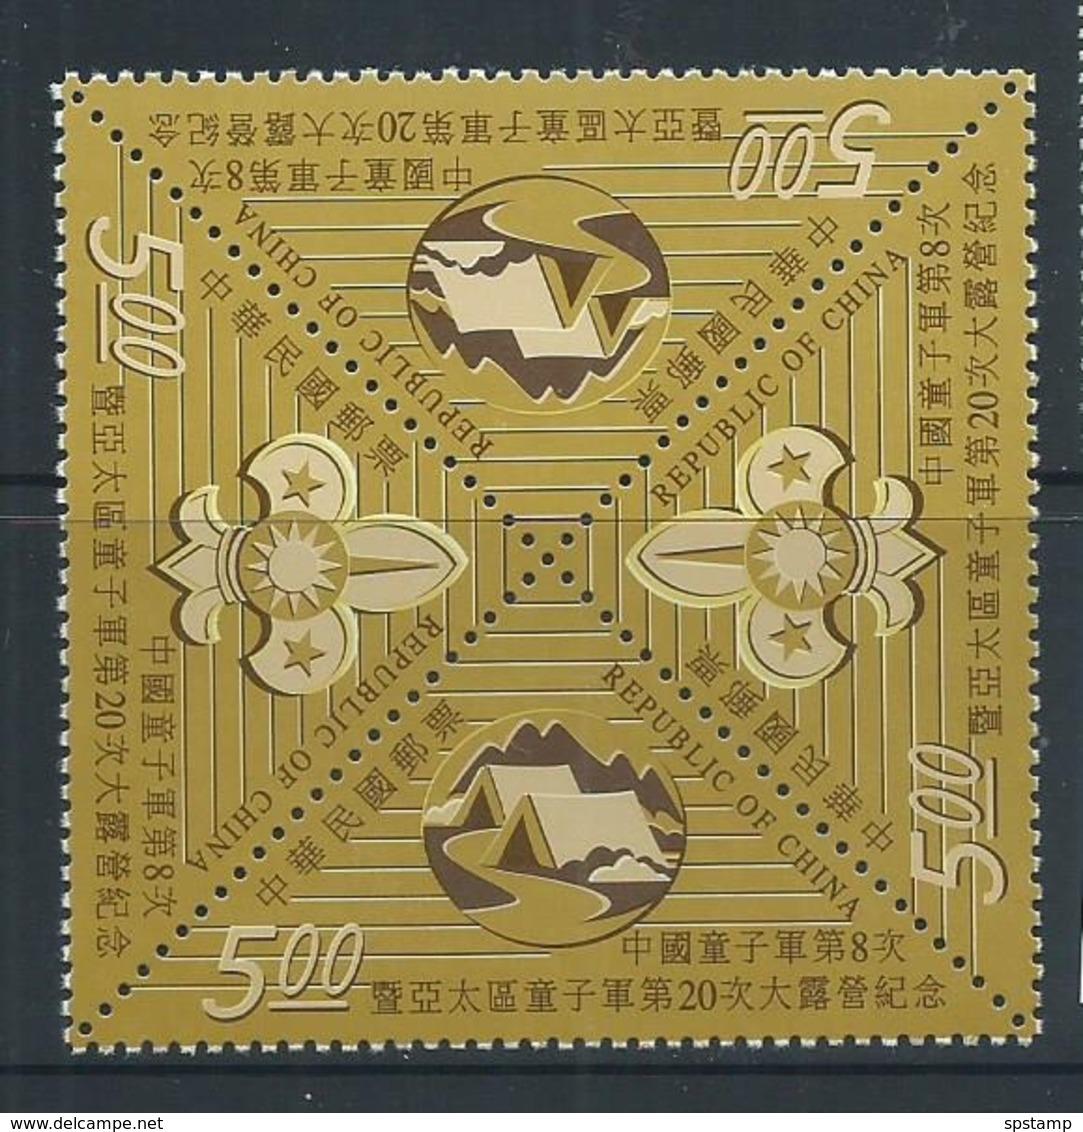 Taiwan Republic Of China 1998 Boy Scout Block Of 4 Triangular Stamps MNH - 1945-... Republic Of China